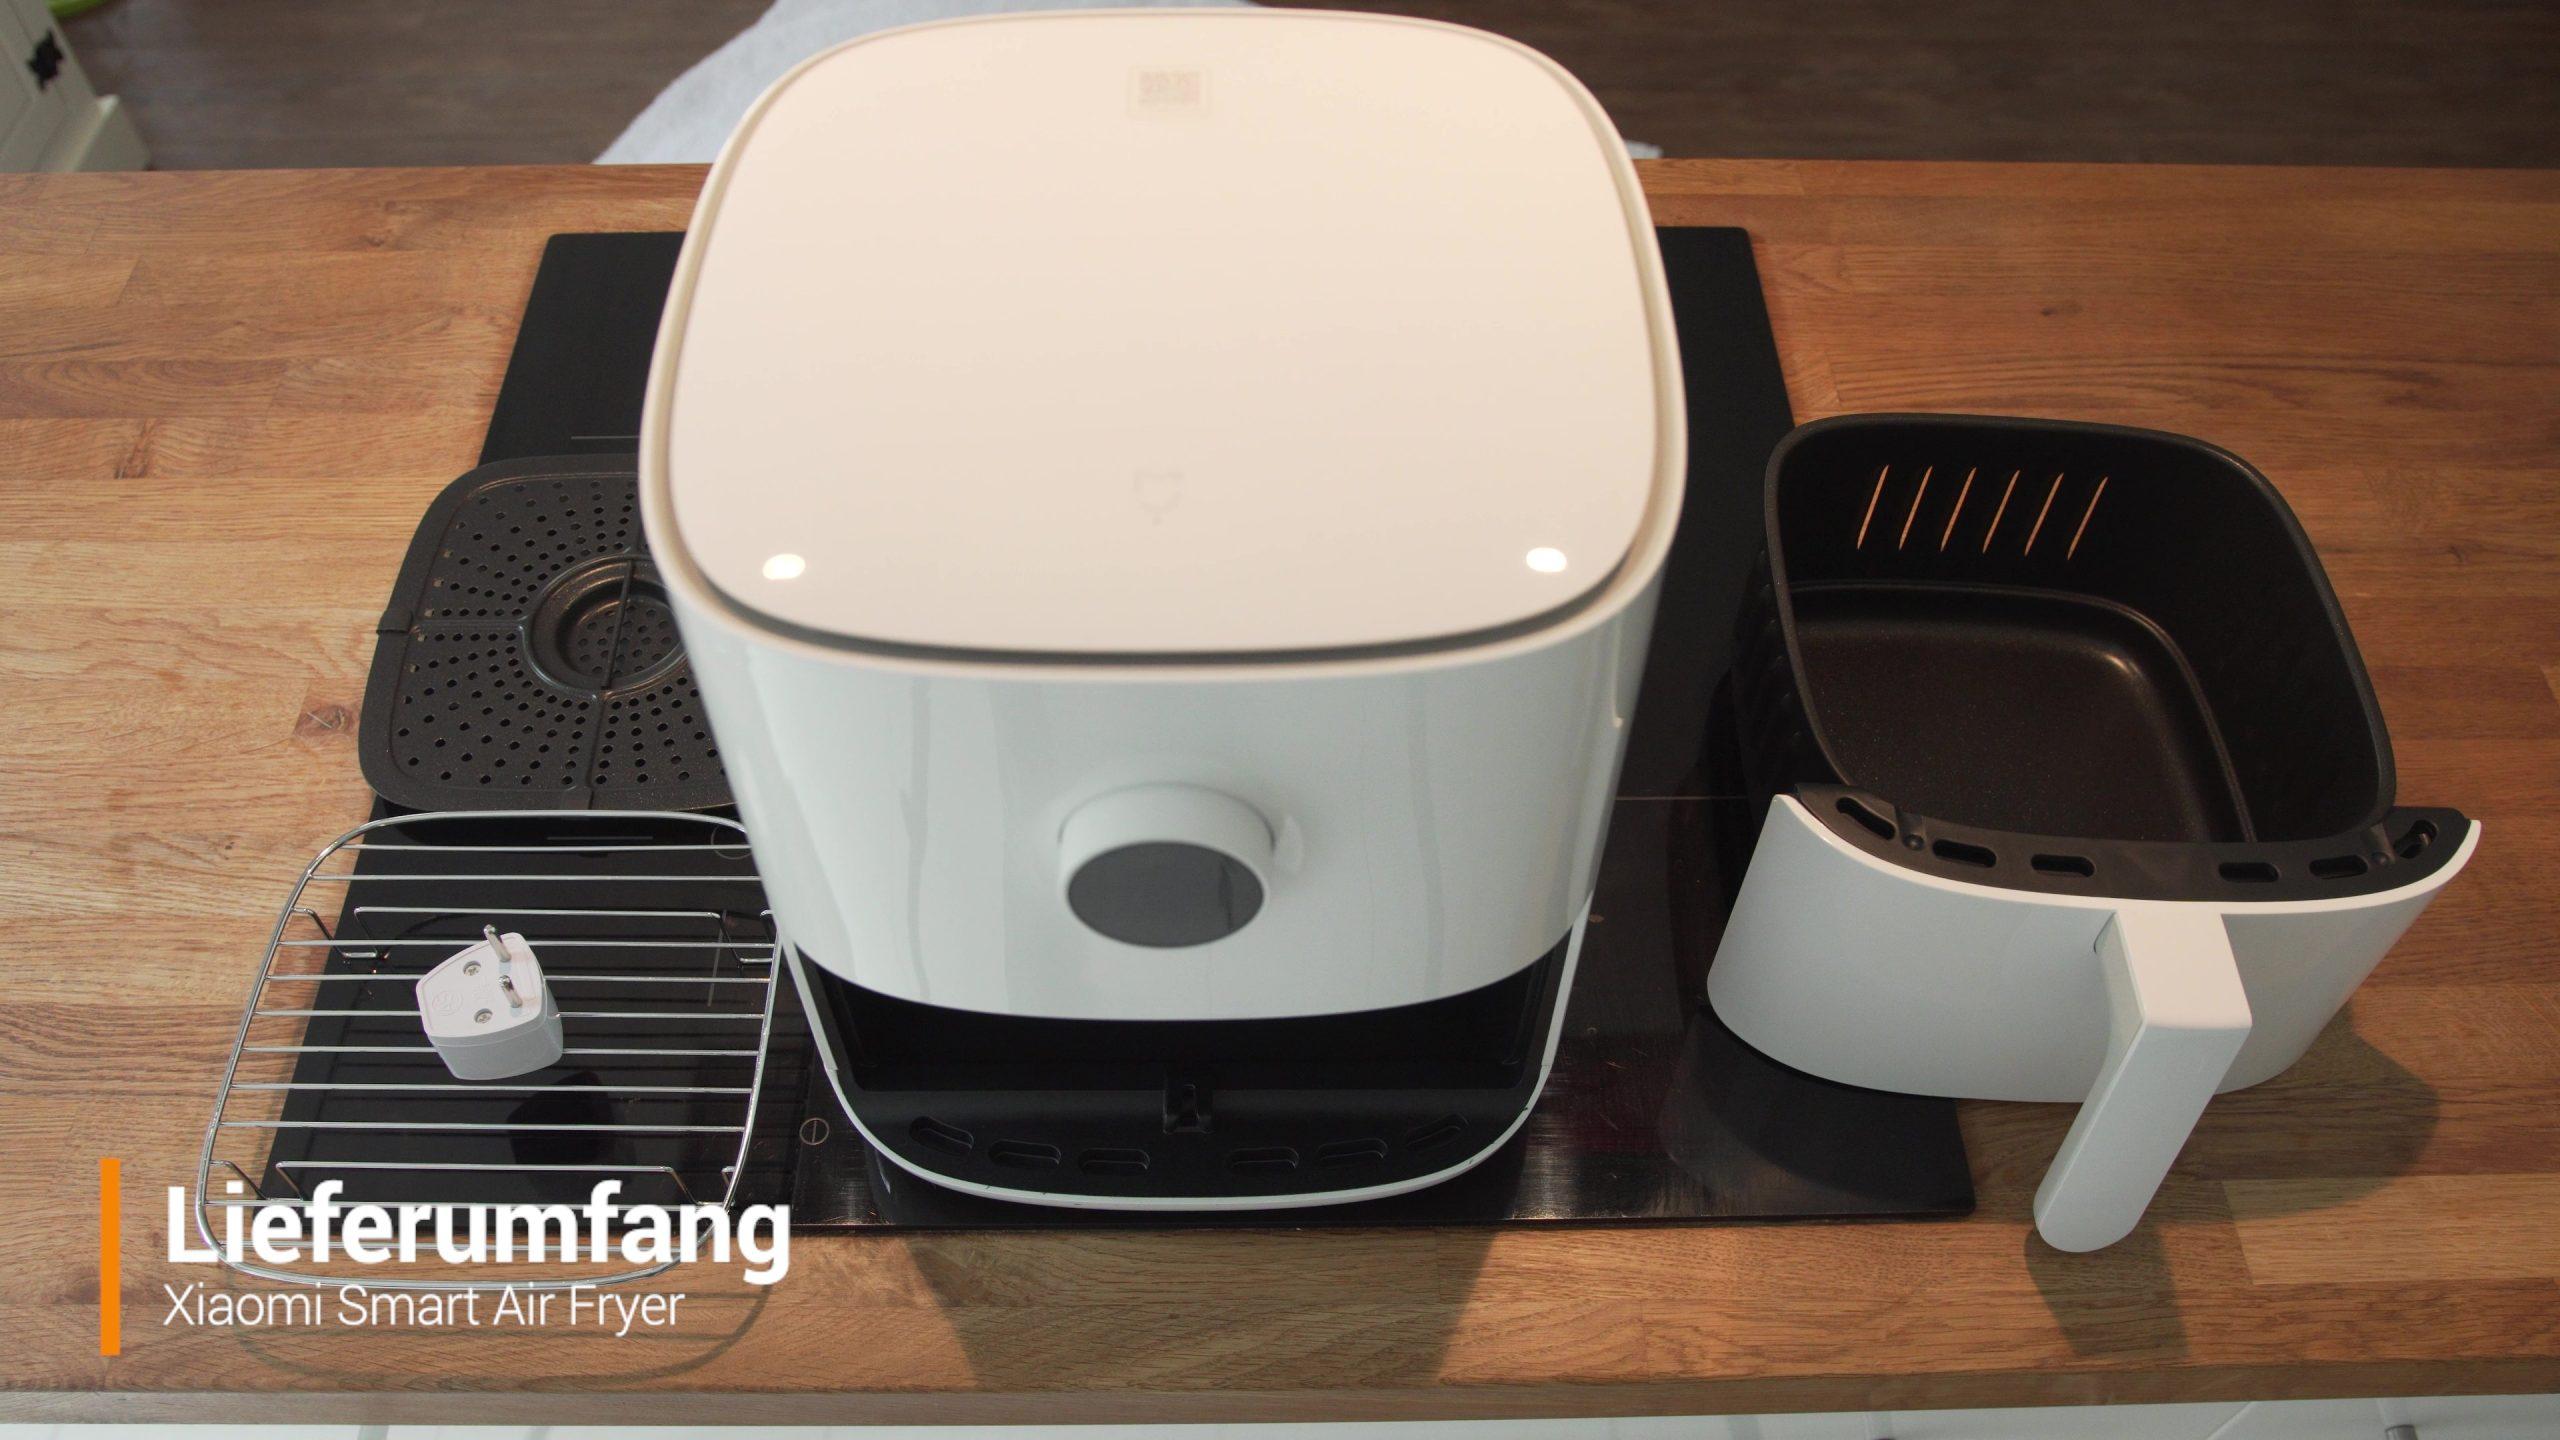 Xiaomi Airfryer Heissluftfritteuse Lieferumfang